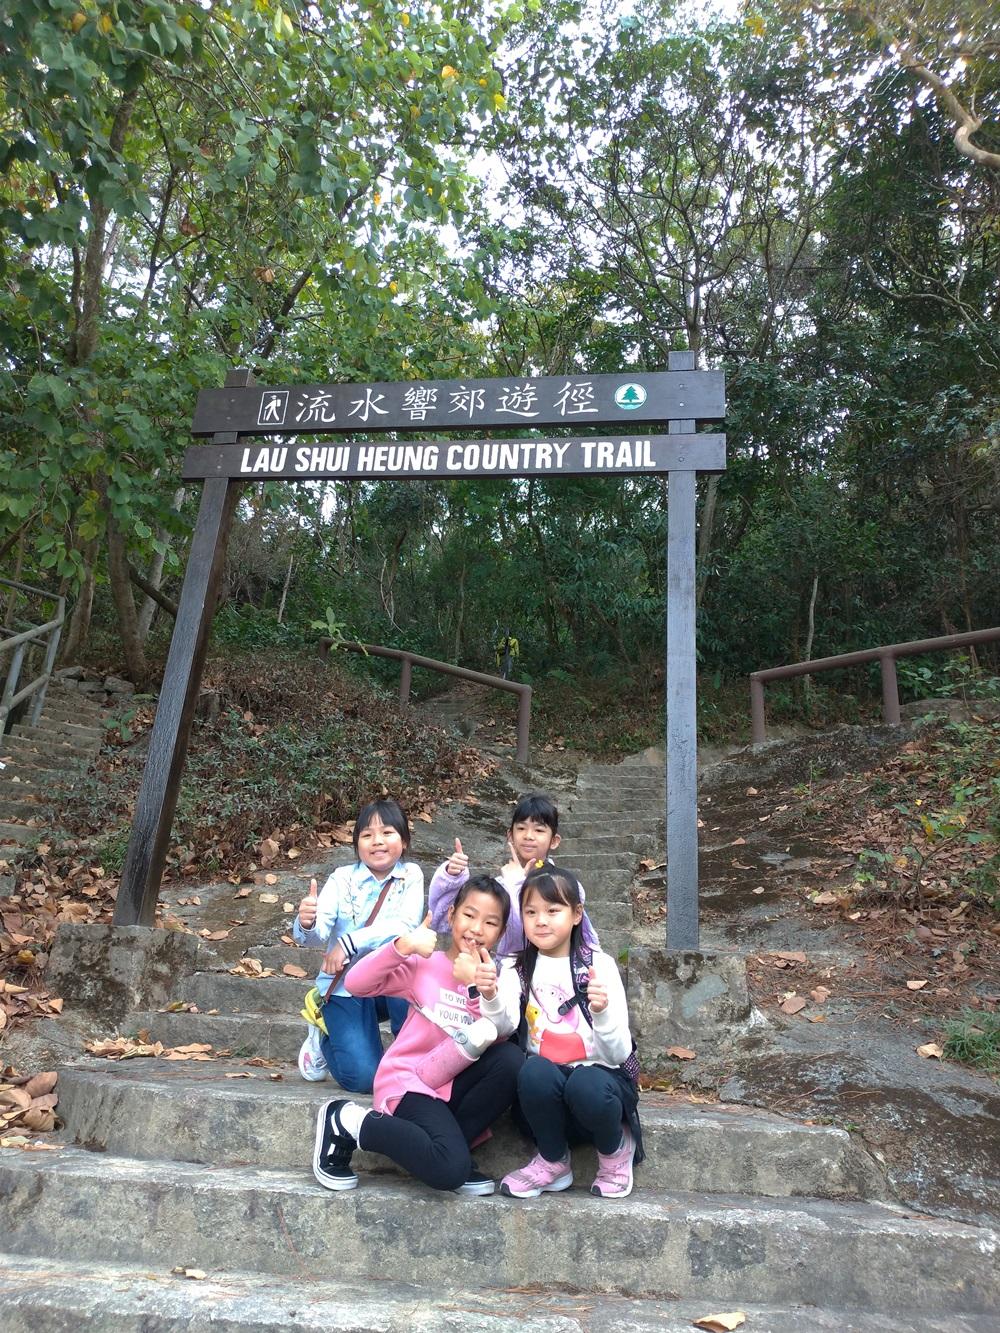 https://skhtswlo.edu.hk/sites/default/files/p_20200118_103452.jpg